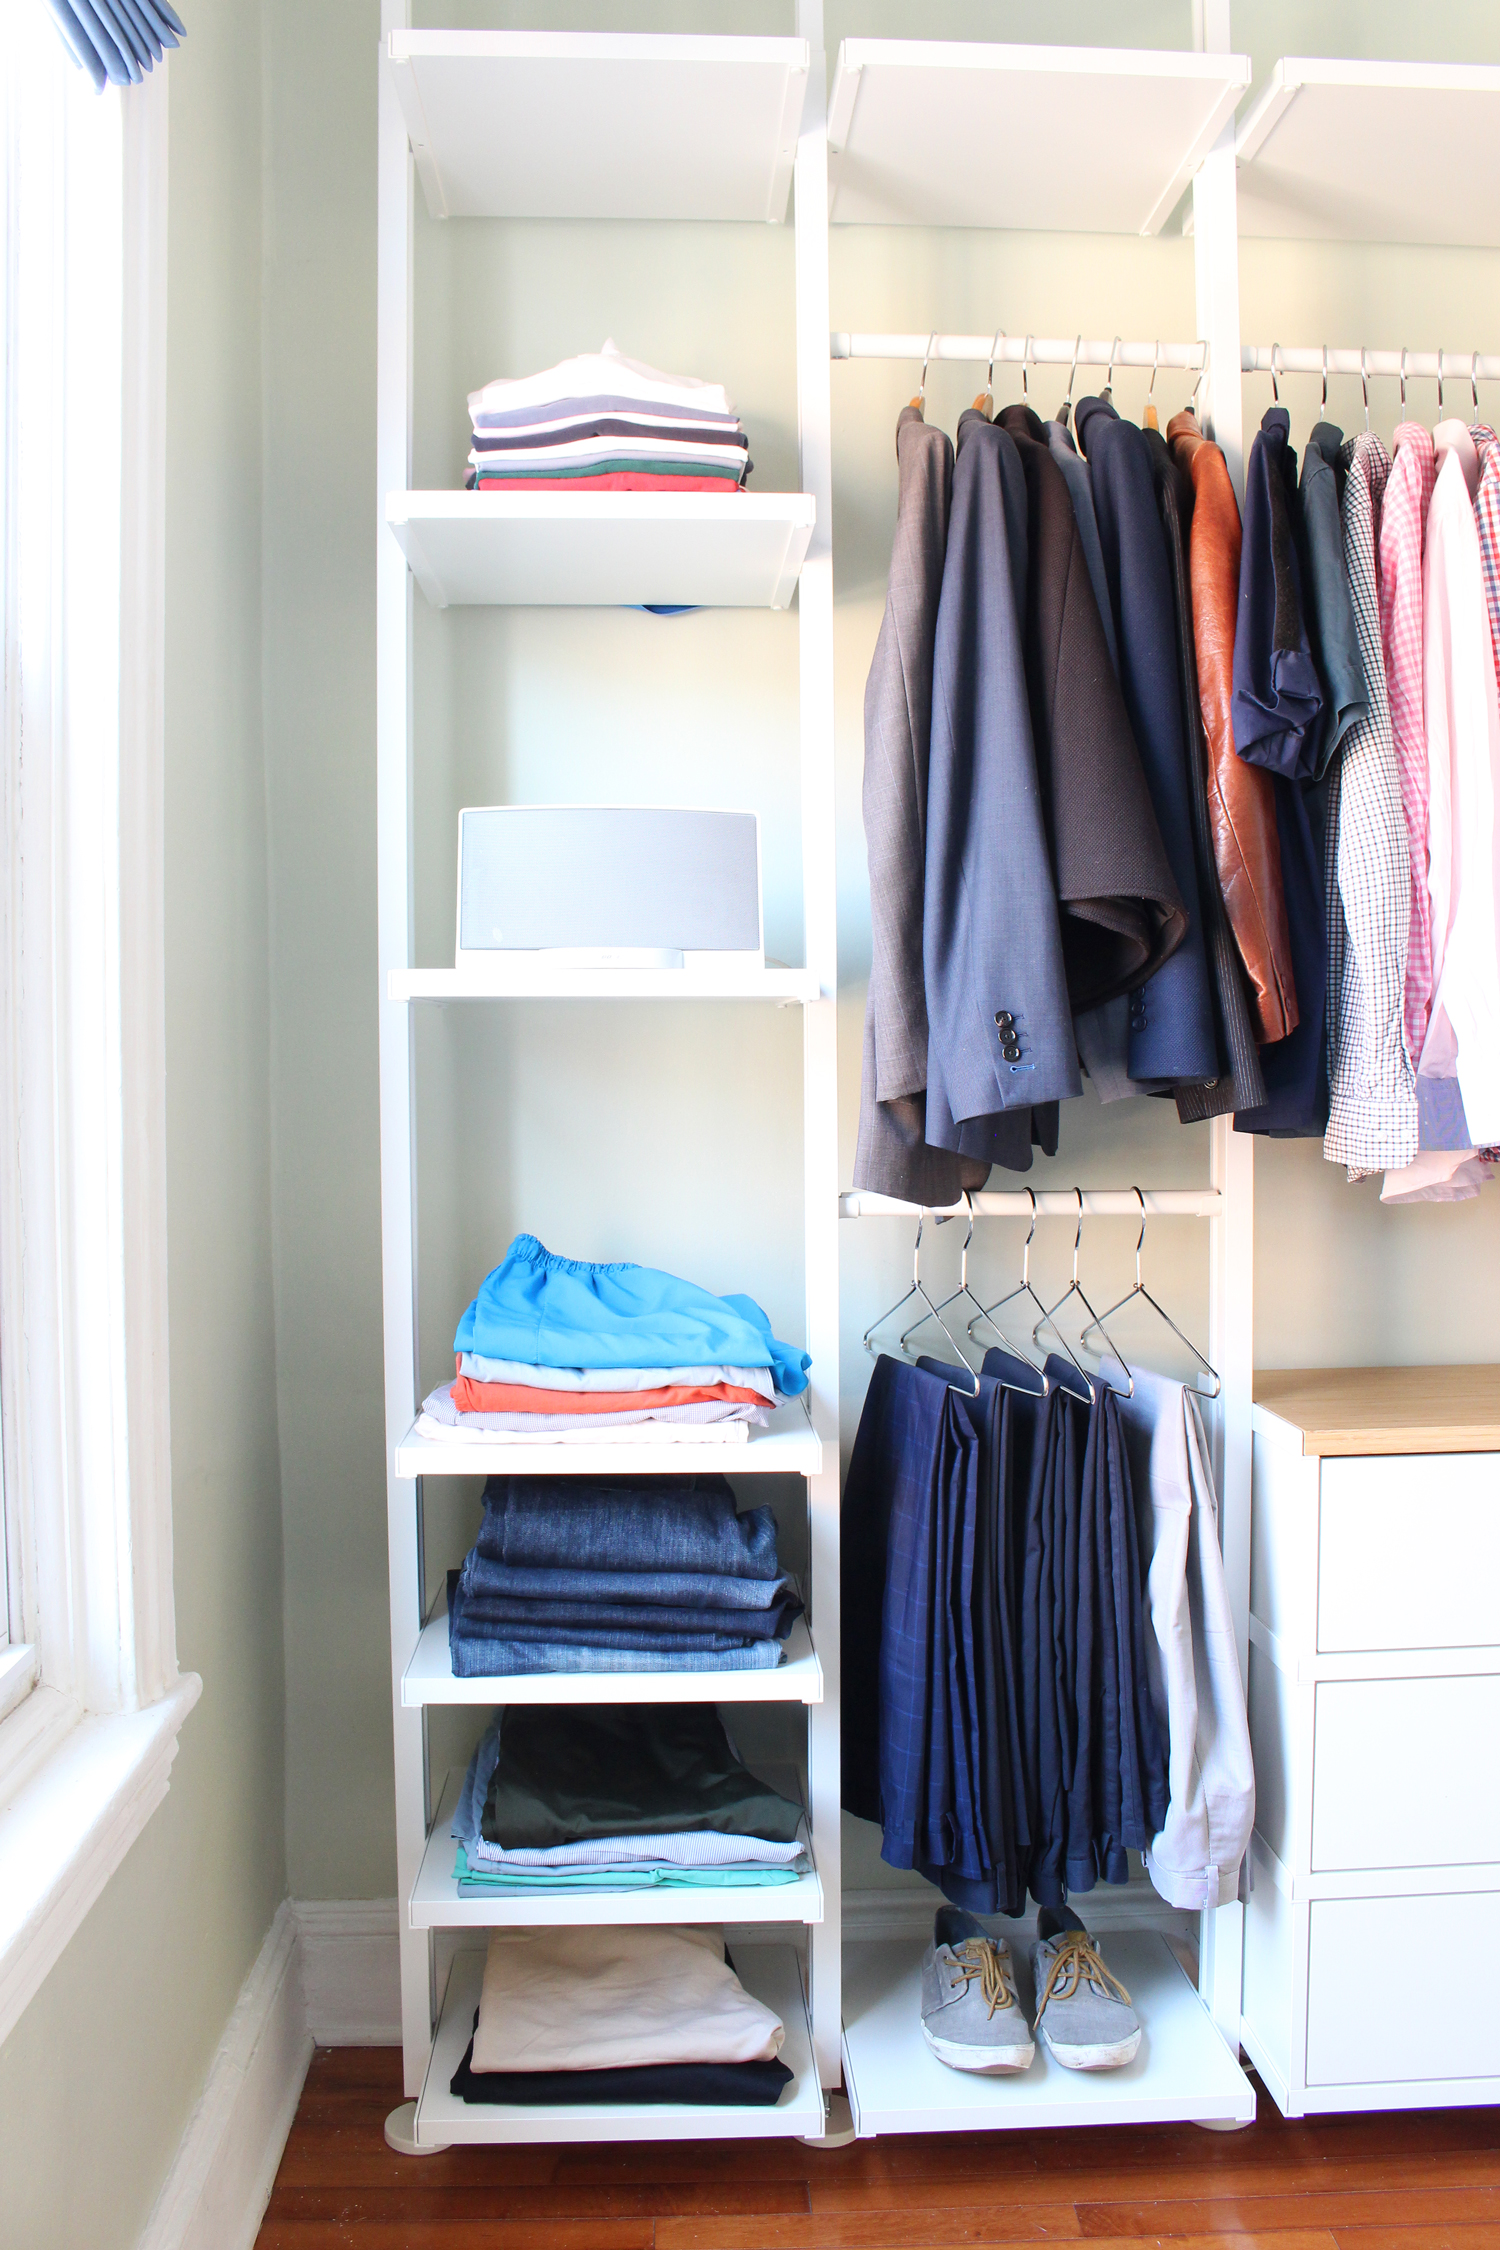 IKEA-Elvarli-Open-Closet-System-5.jpg